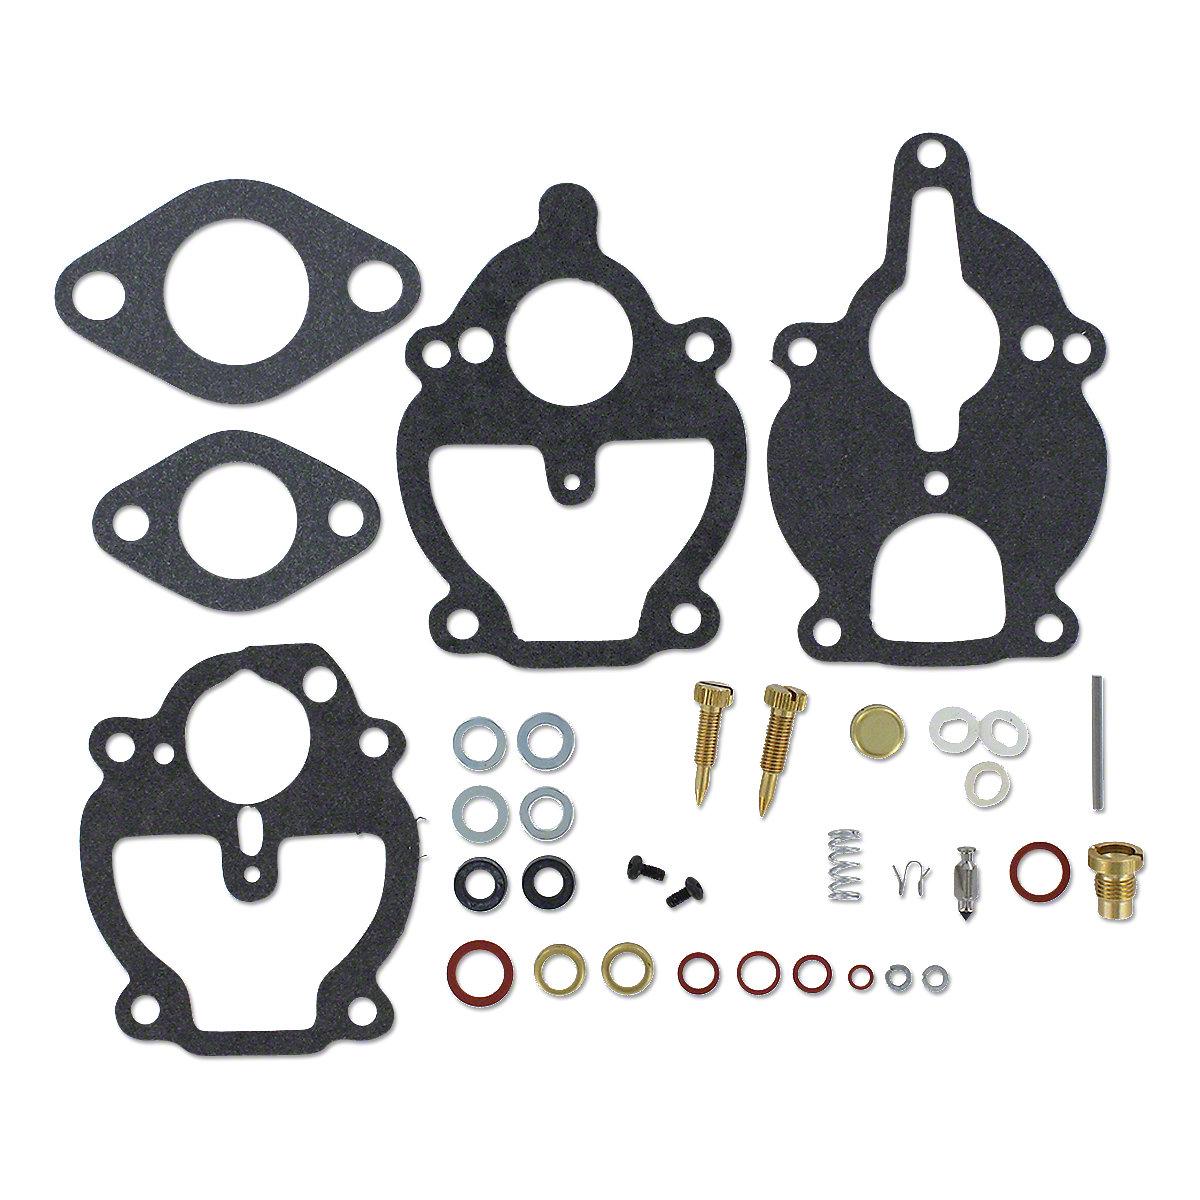 ABC1346Economy Zenith Carburetor Repair Kit